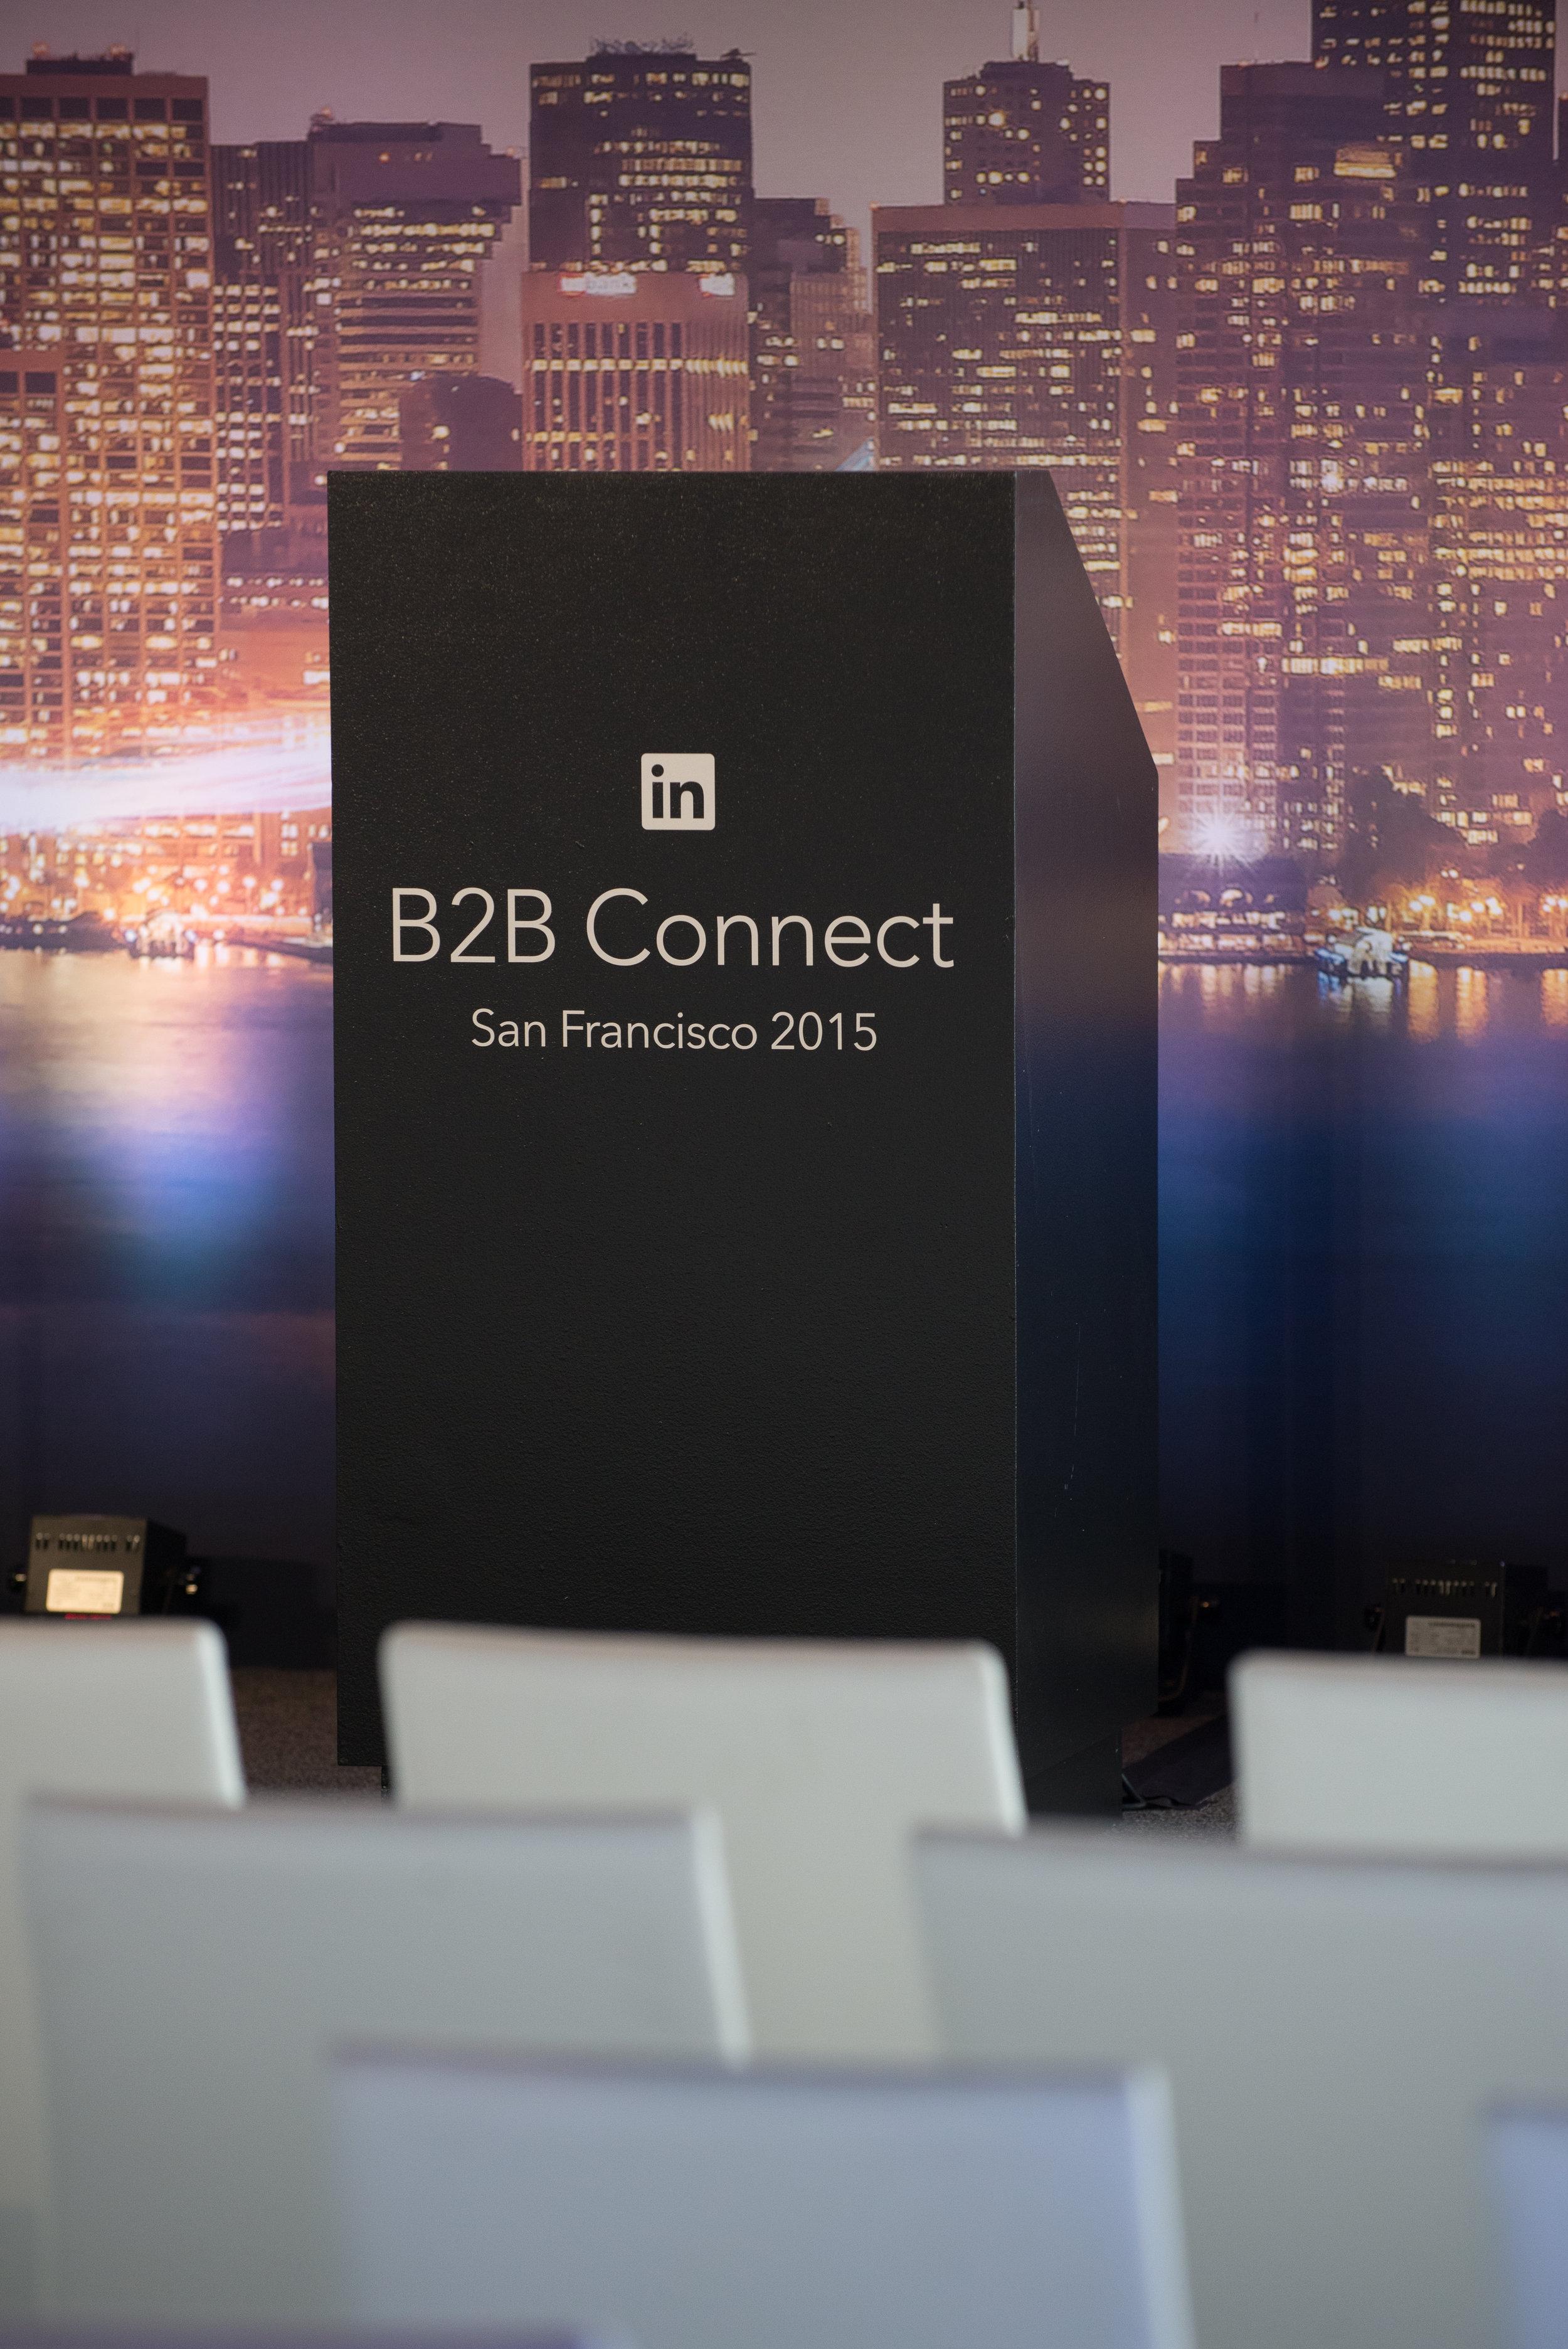 LinkedIn B2B Connect Tour Podium Display